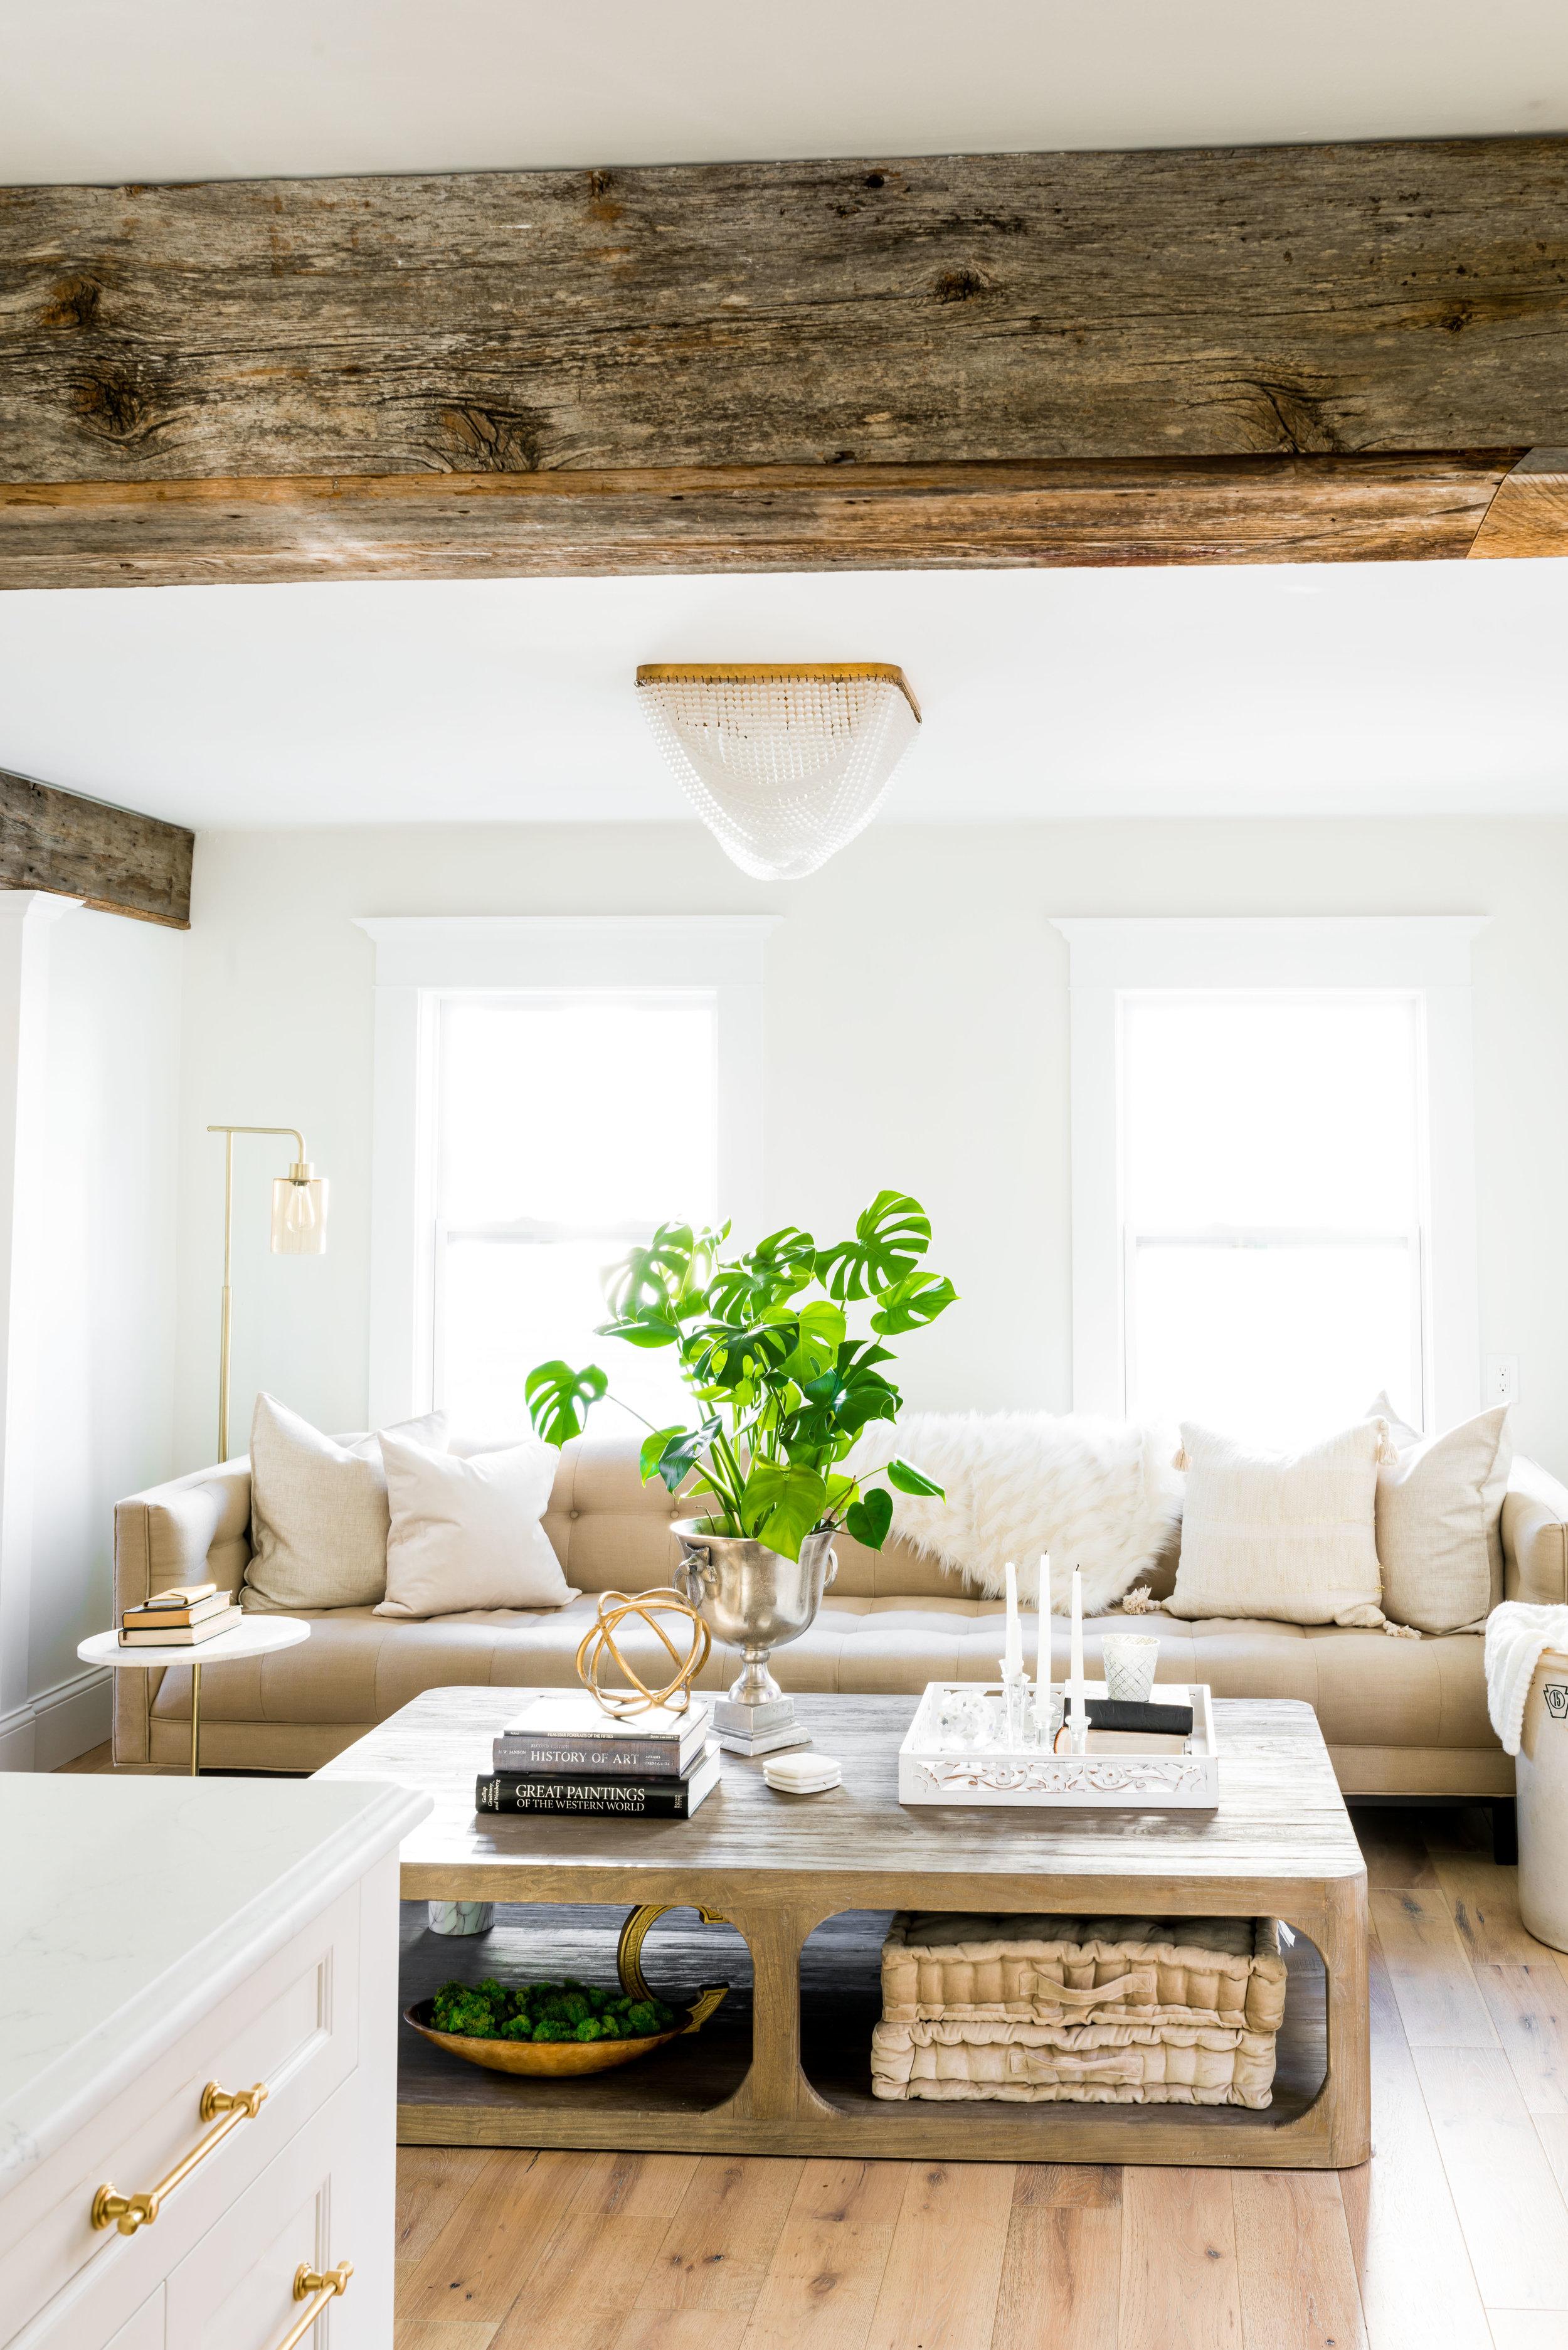 Naturalbeam_livingroom_HouseofDietrich_Charlestown_19thCentury_KitchenRenovation_JessicaDelaney_Bijou.jpg